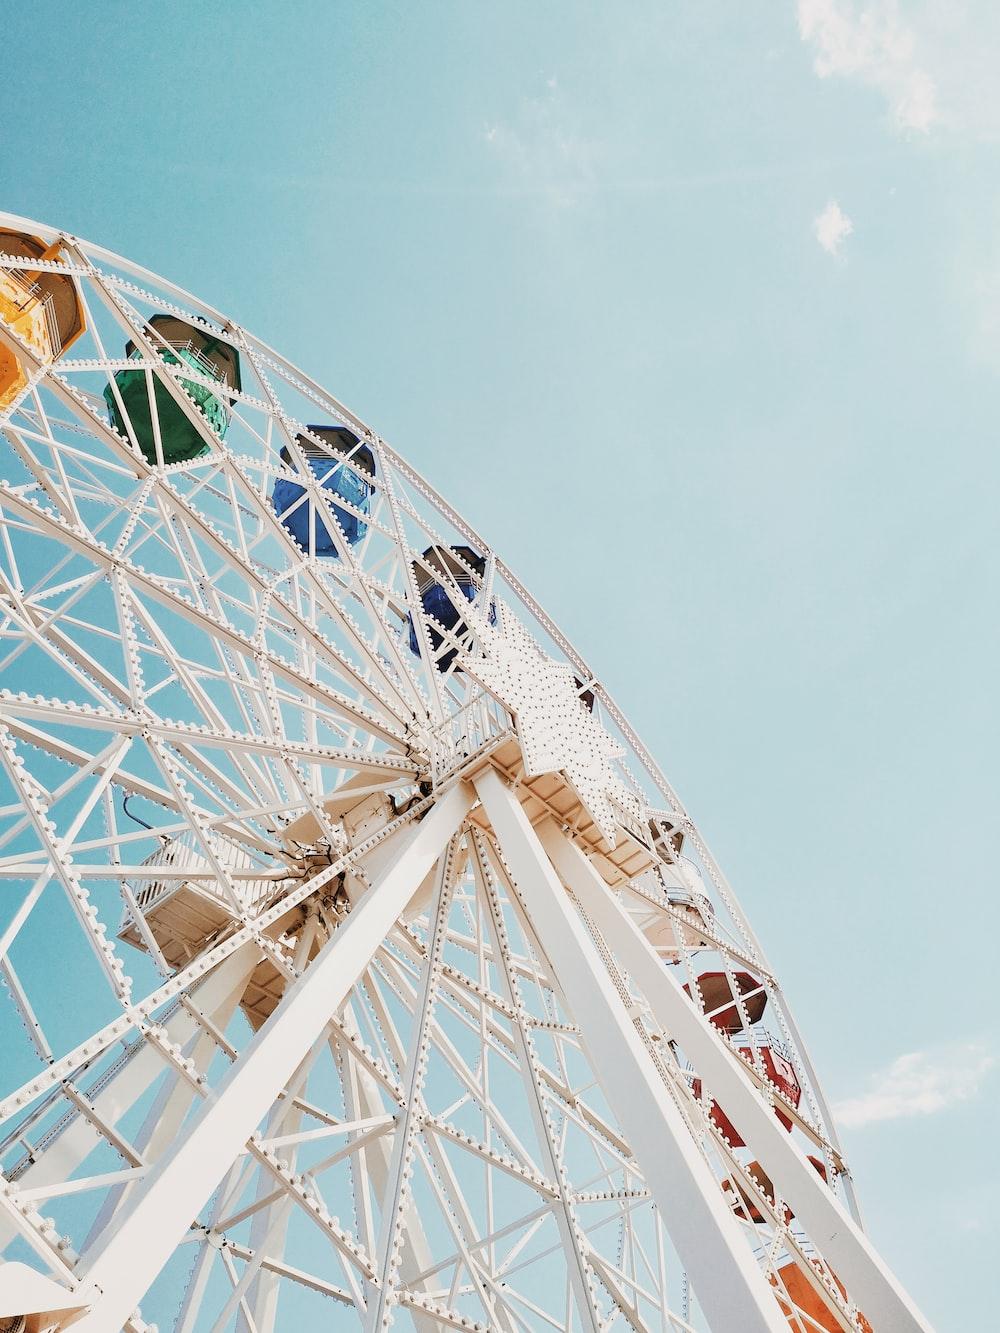 white Ferris wheel across blue sky